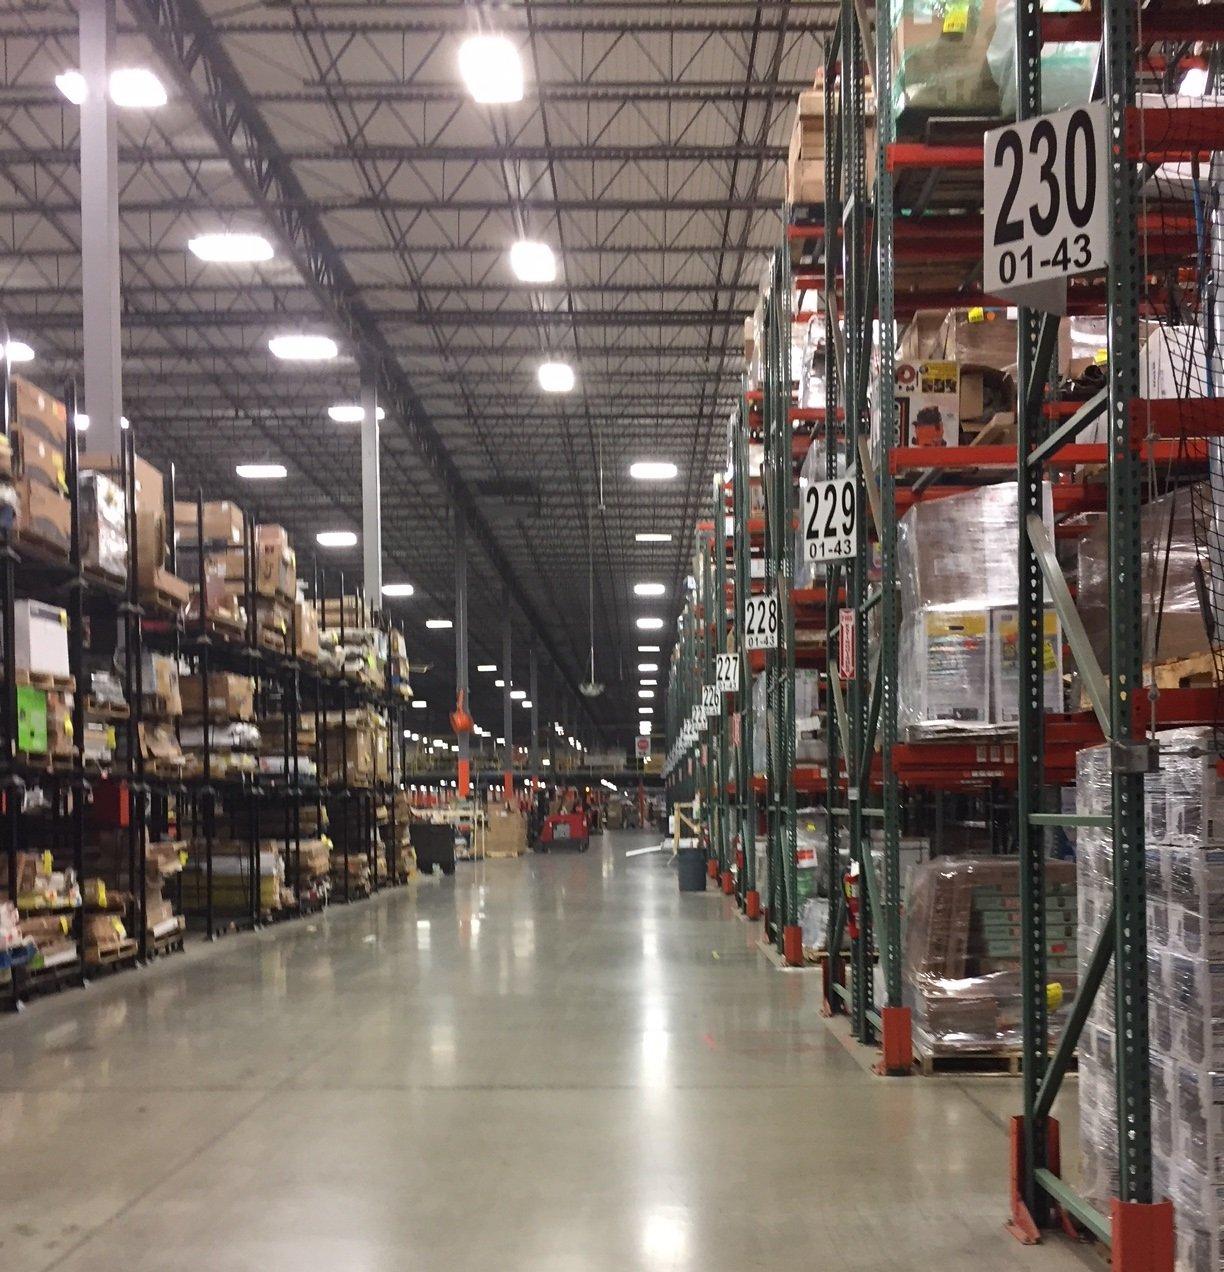 Home Depot Premium Merchandise Truckload, Home Depot